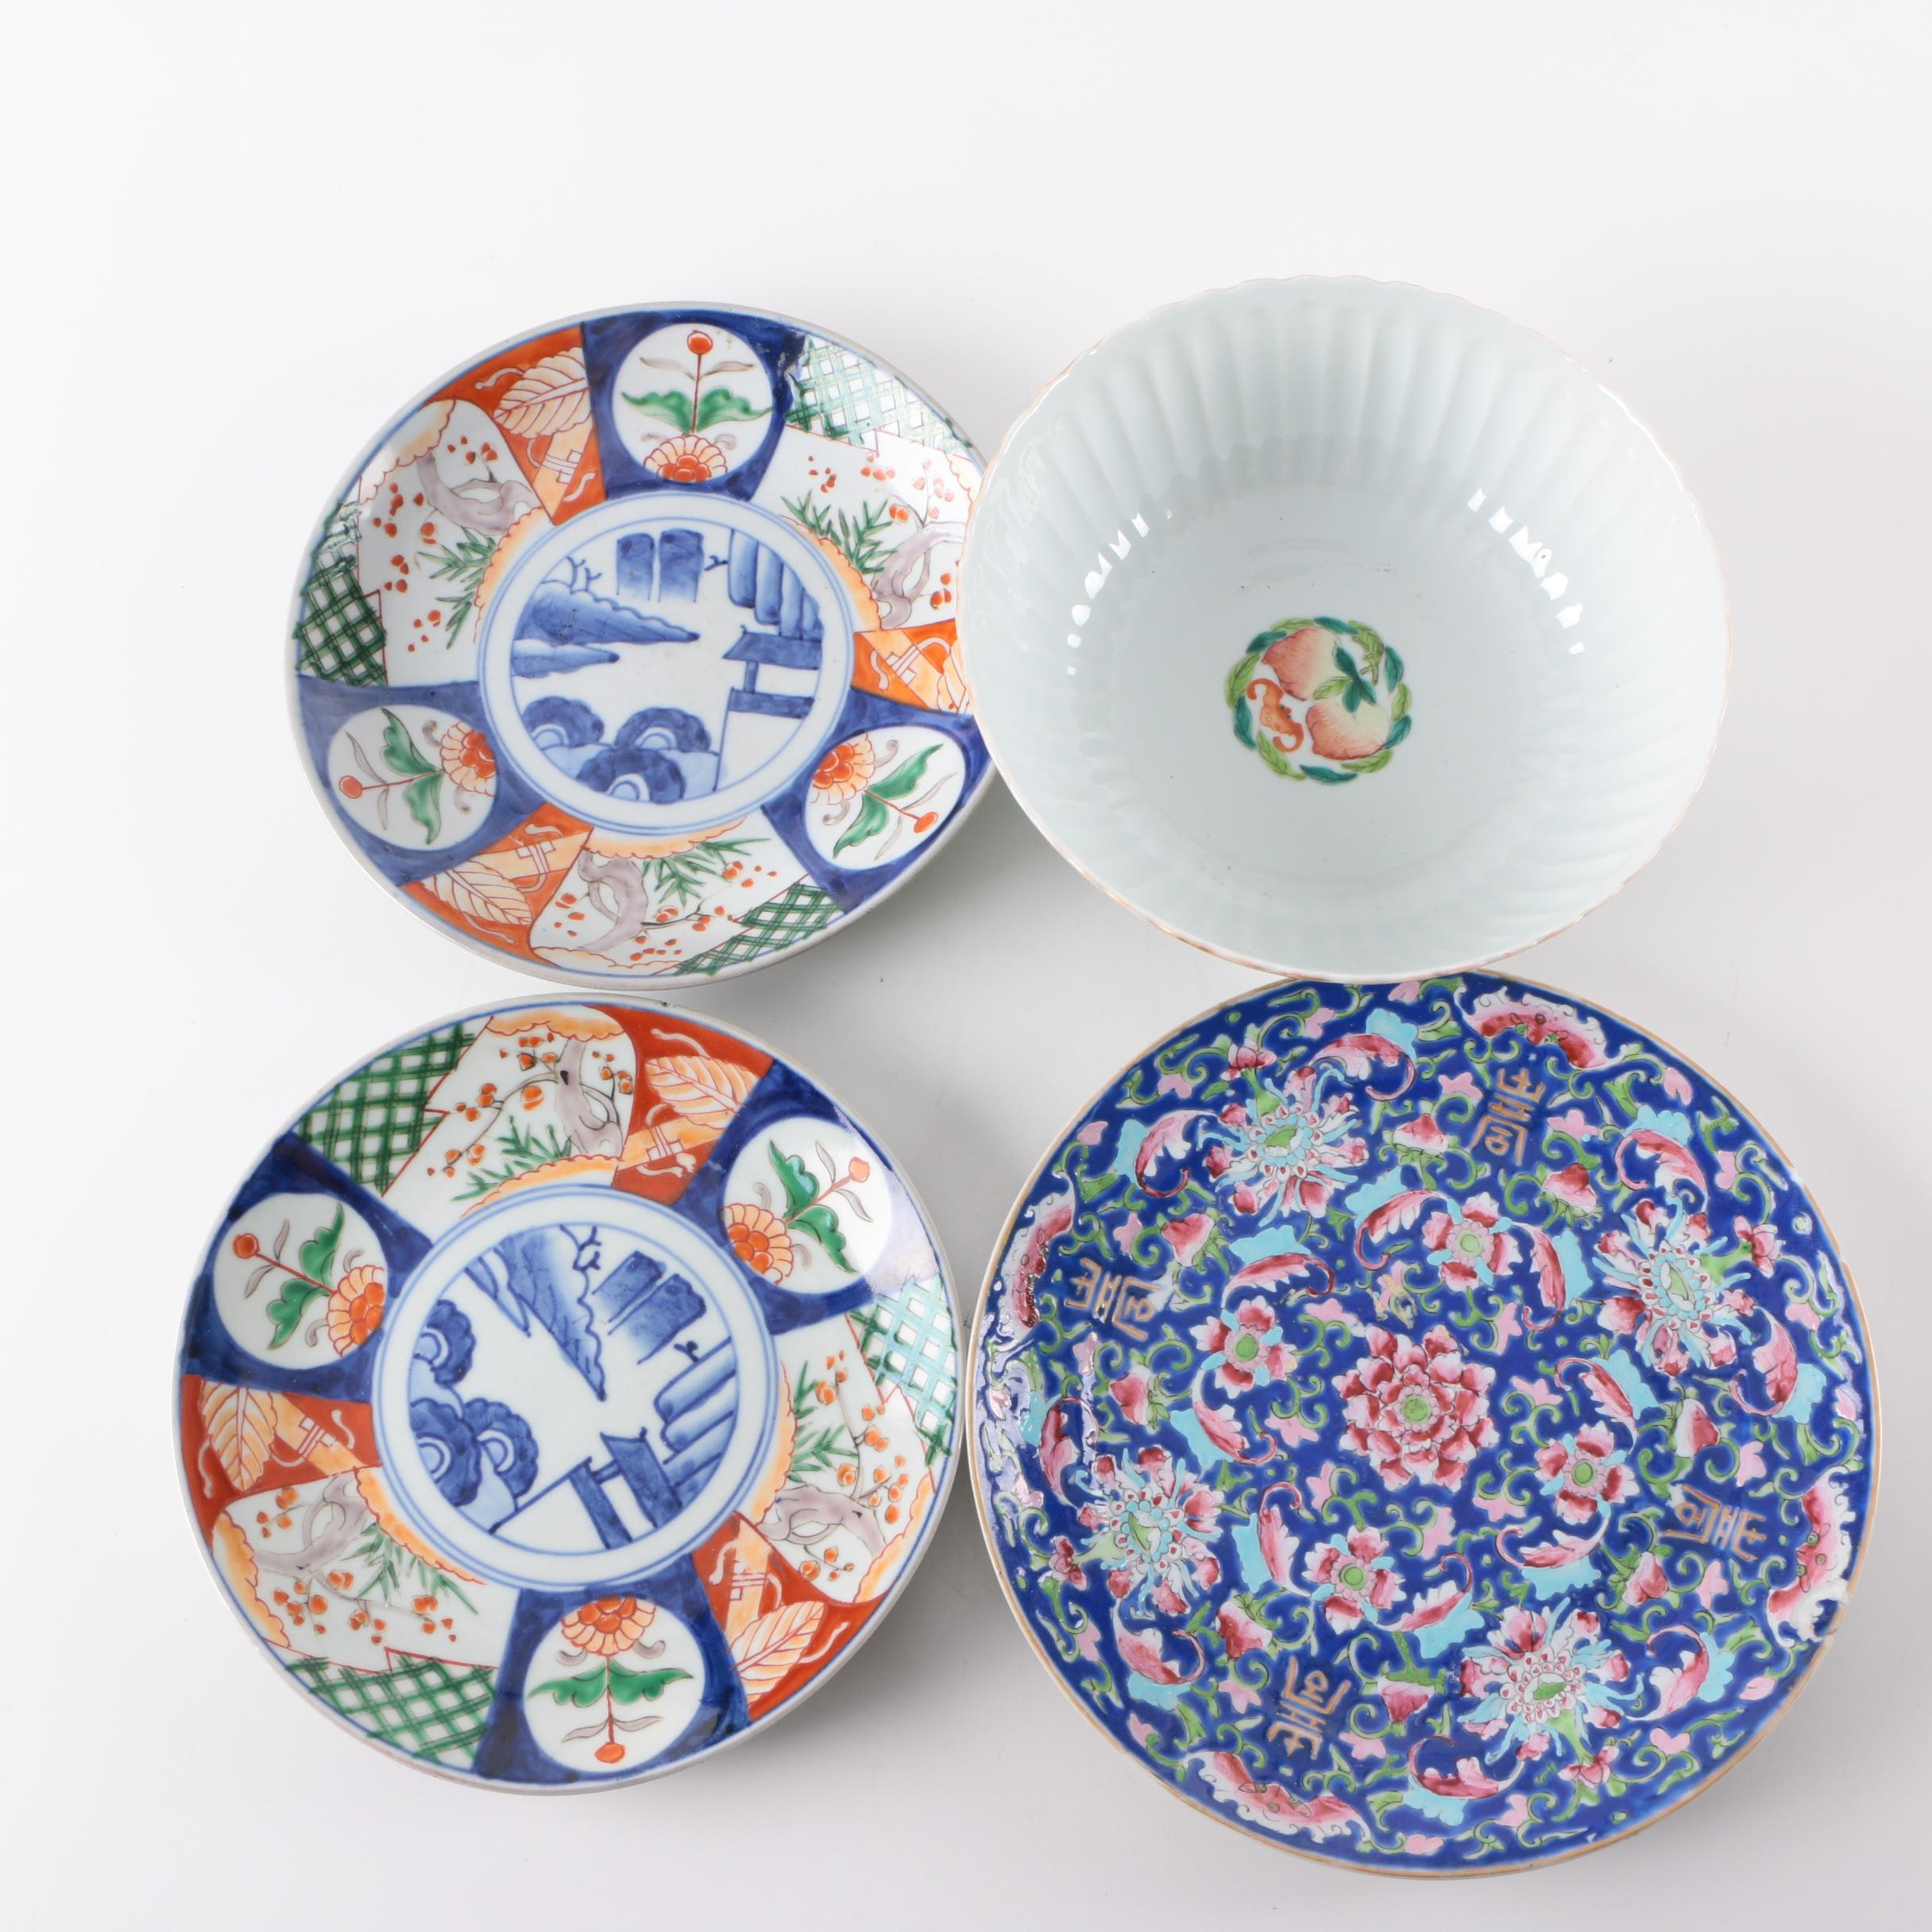 Ceramic and Porcelain Serveware Including Imari Style